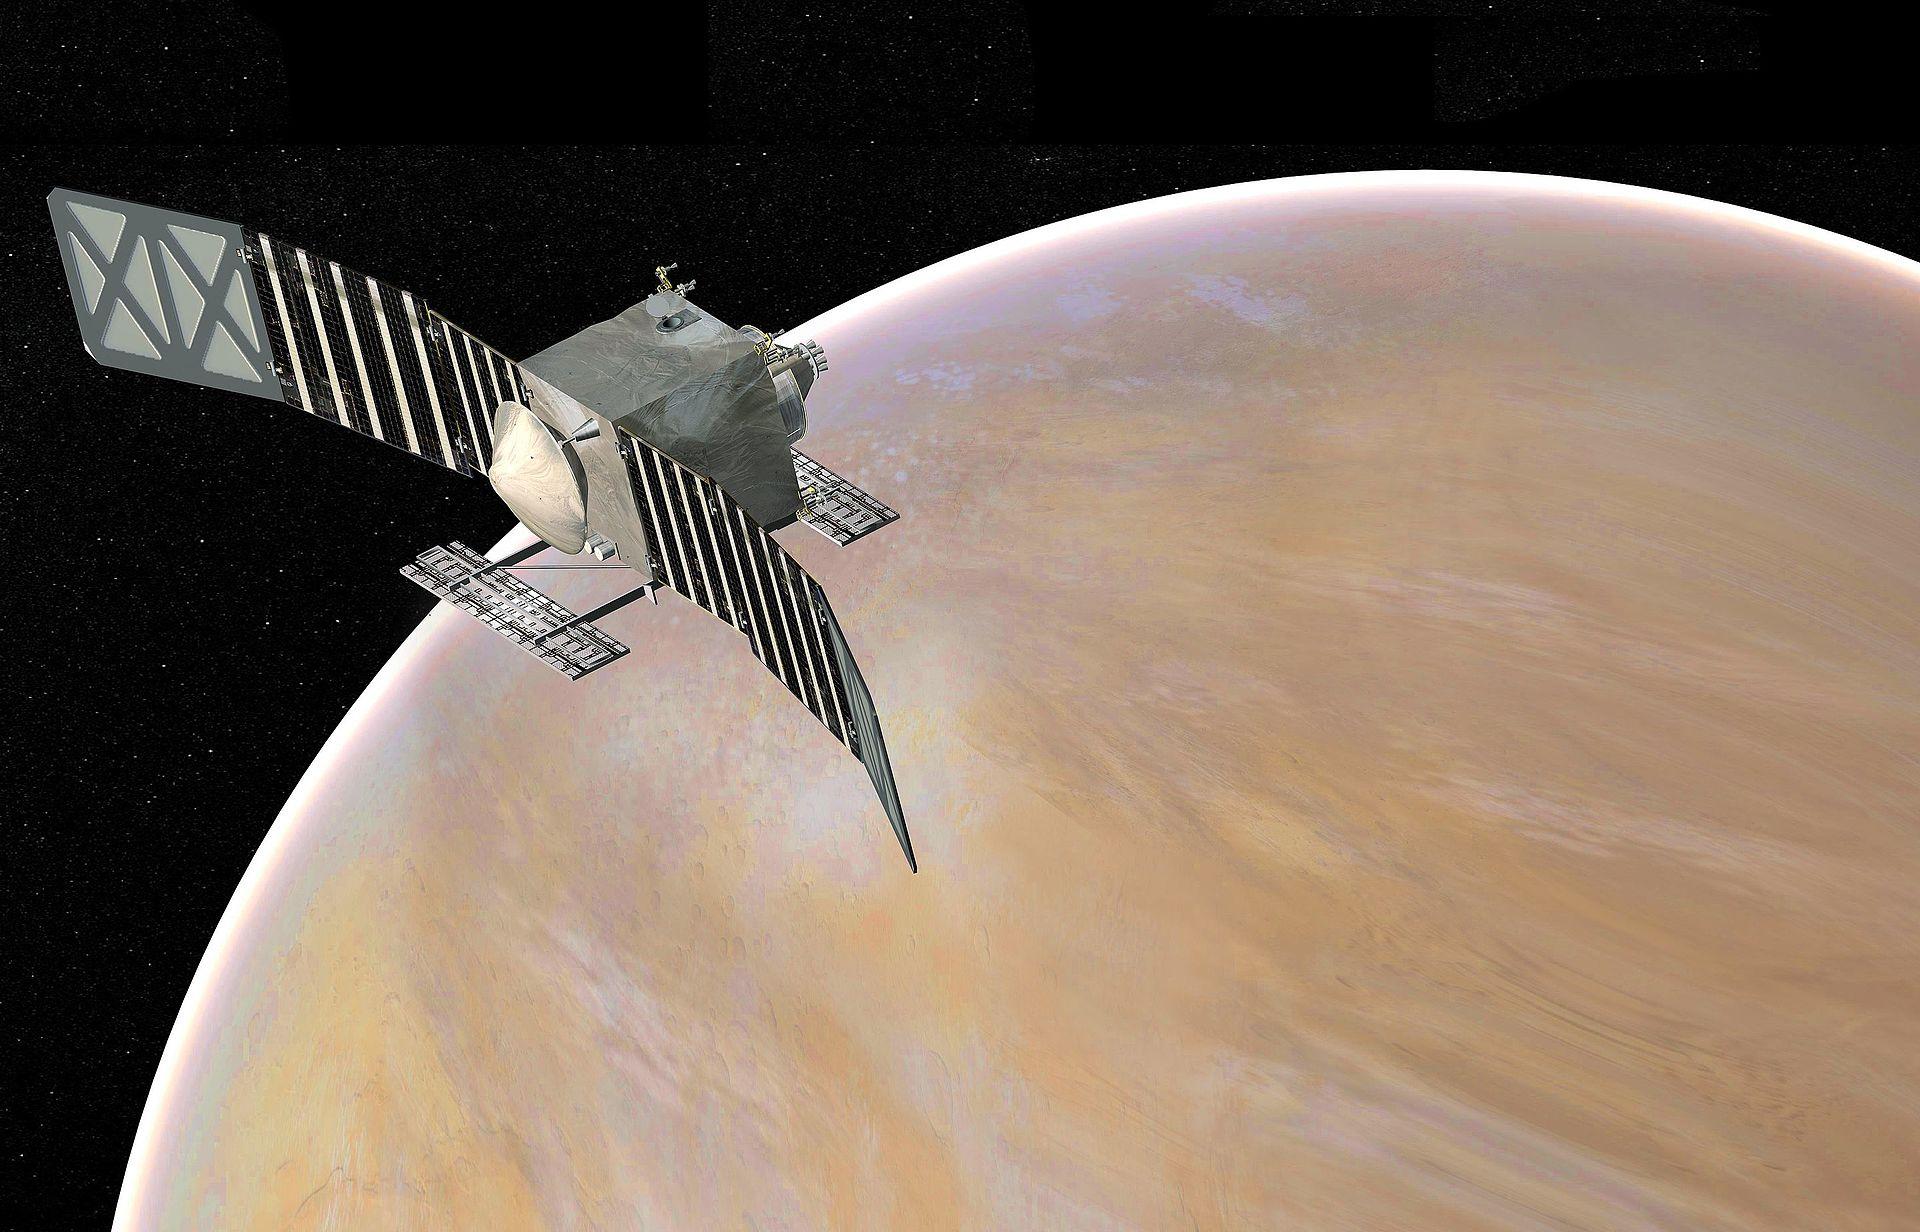 Exploring VERITAS, one of NASA's new missions to Venus